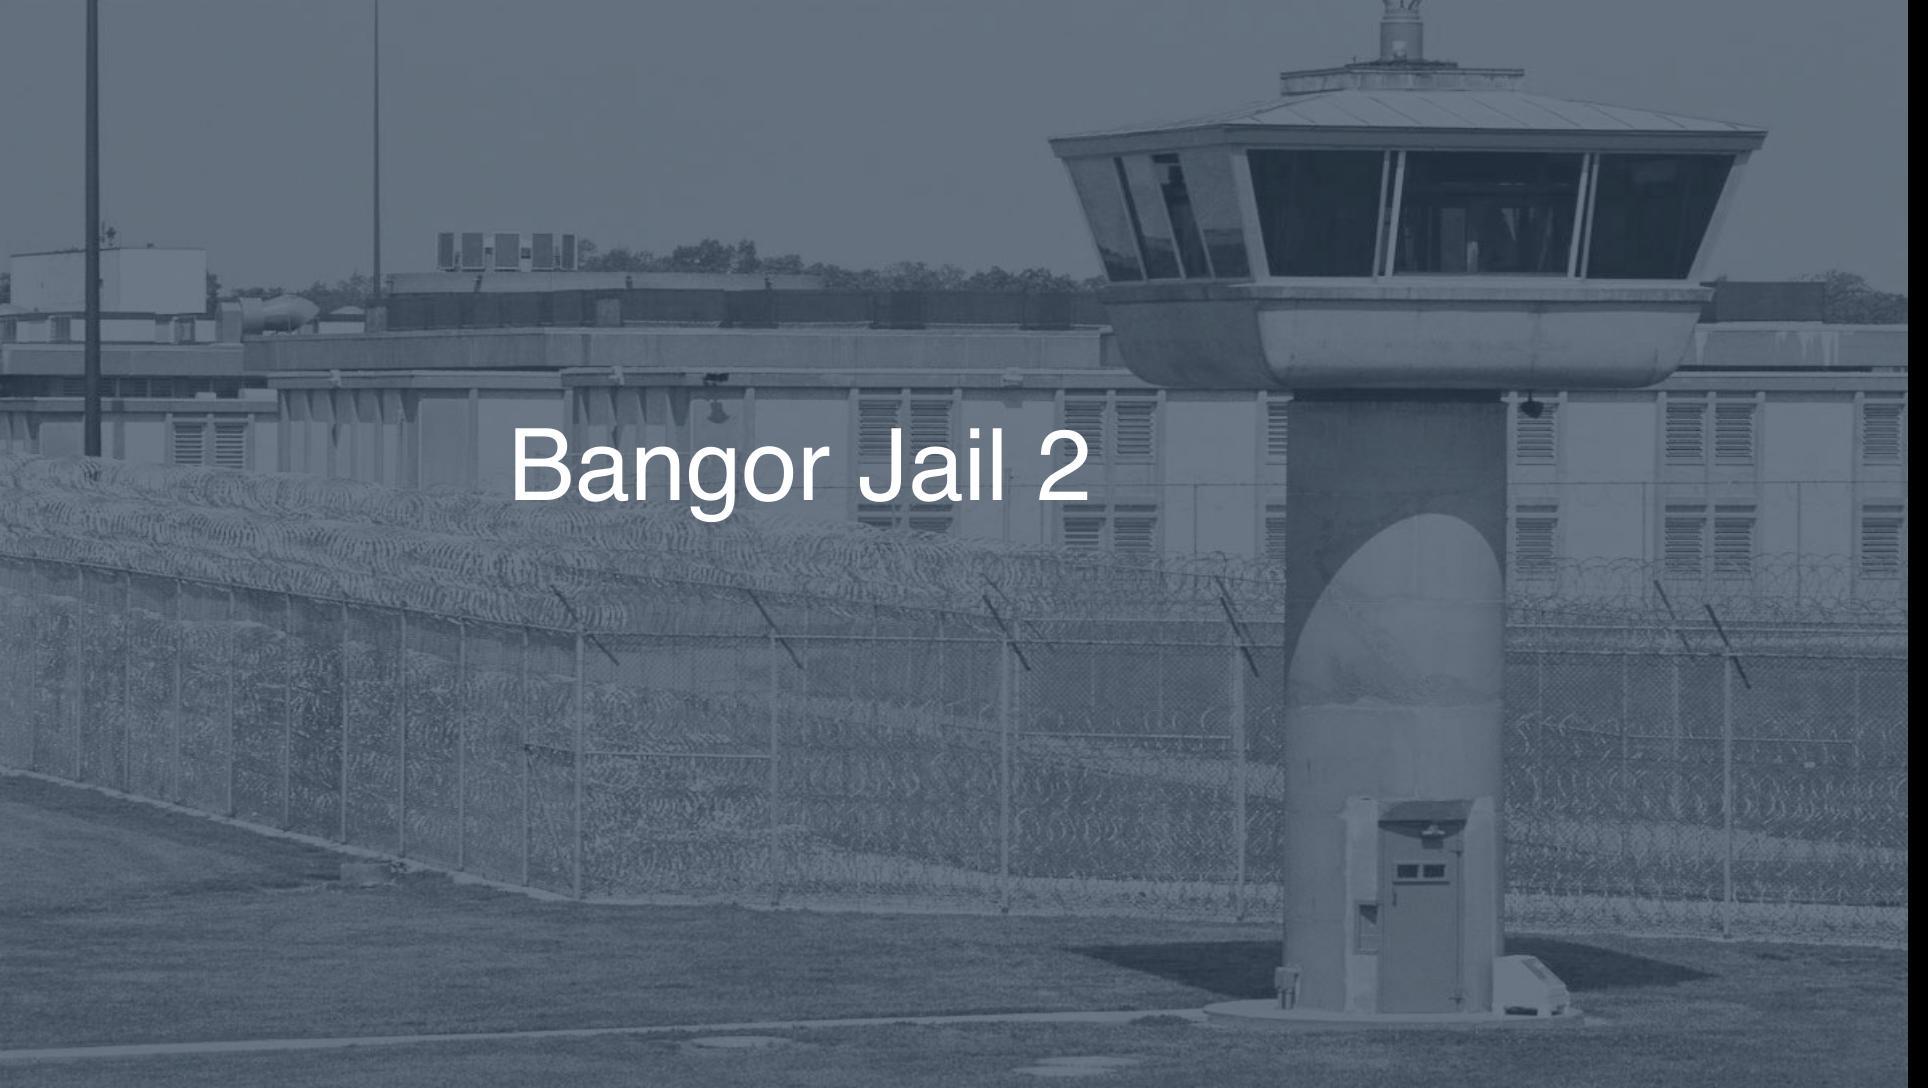 Bangor Jail correctional facility picture